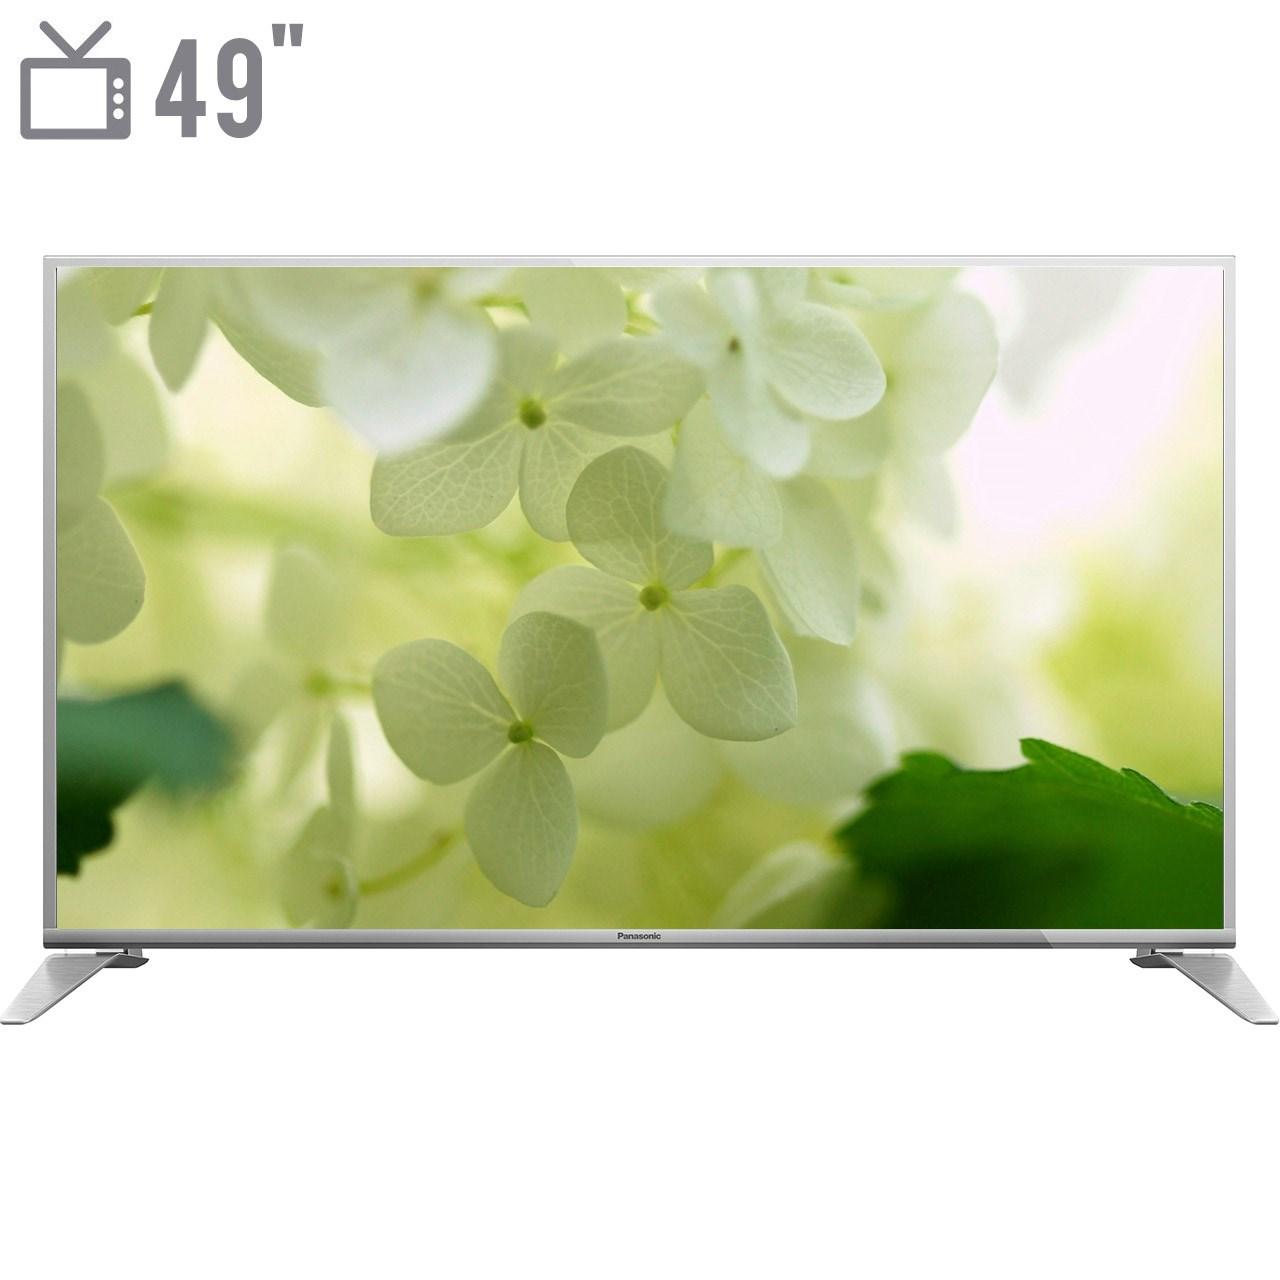 فروش نقدی و اقساطی تلویزیون ال ای دی هوشمند پاناسونیک مدل 49DS630R سایز 49 اینچ